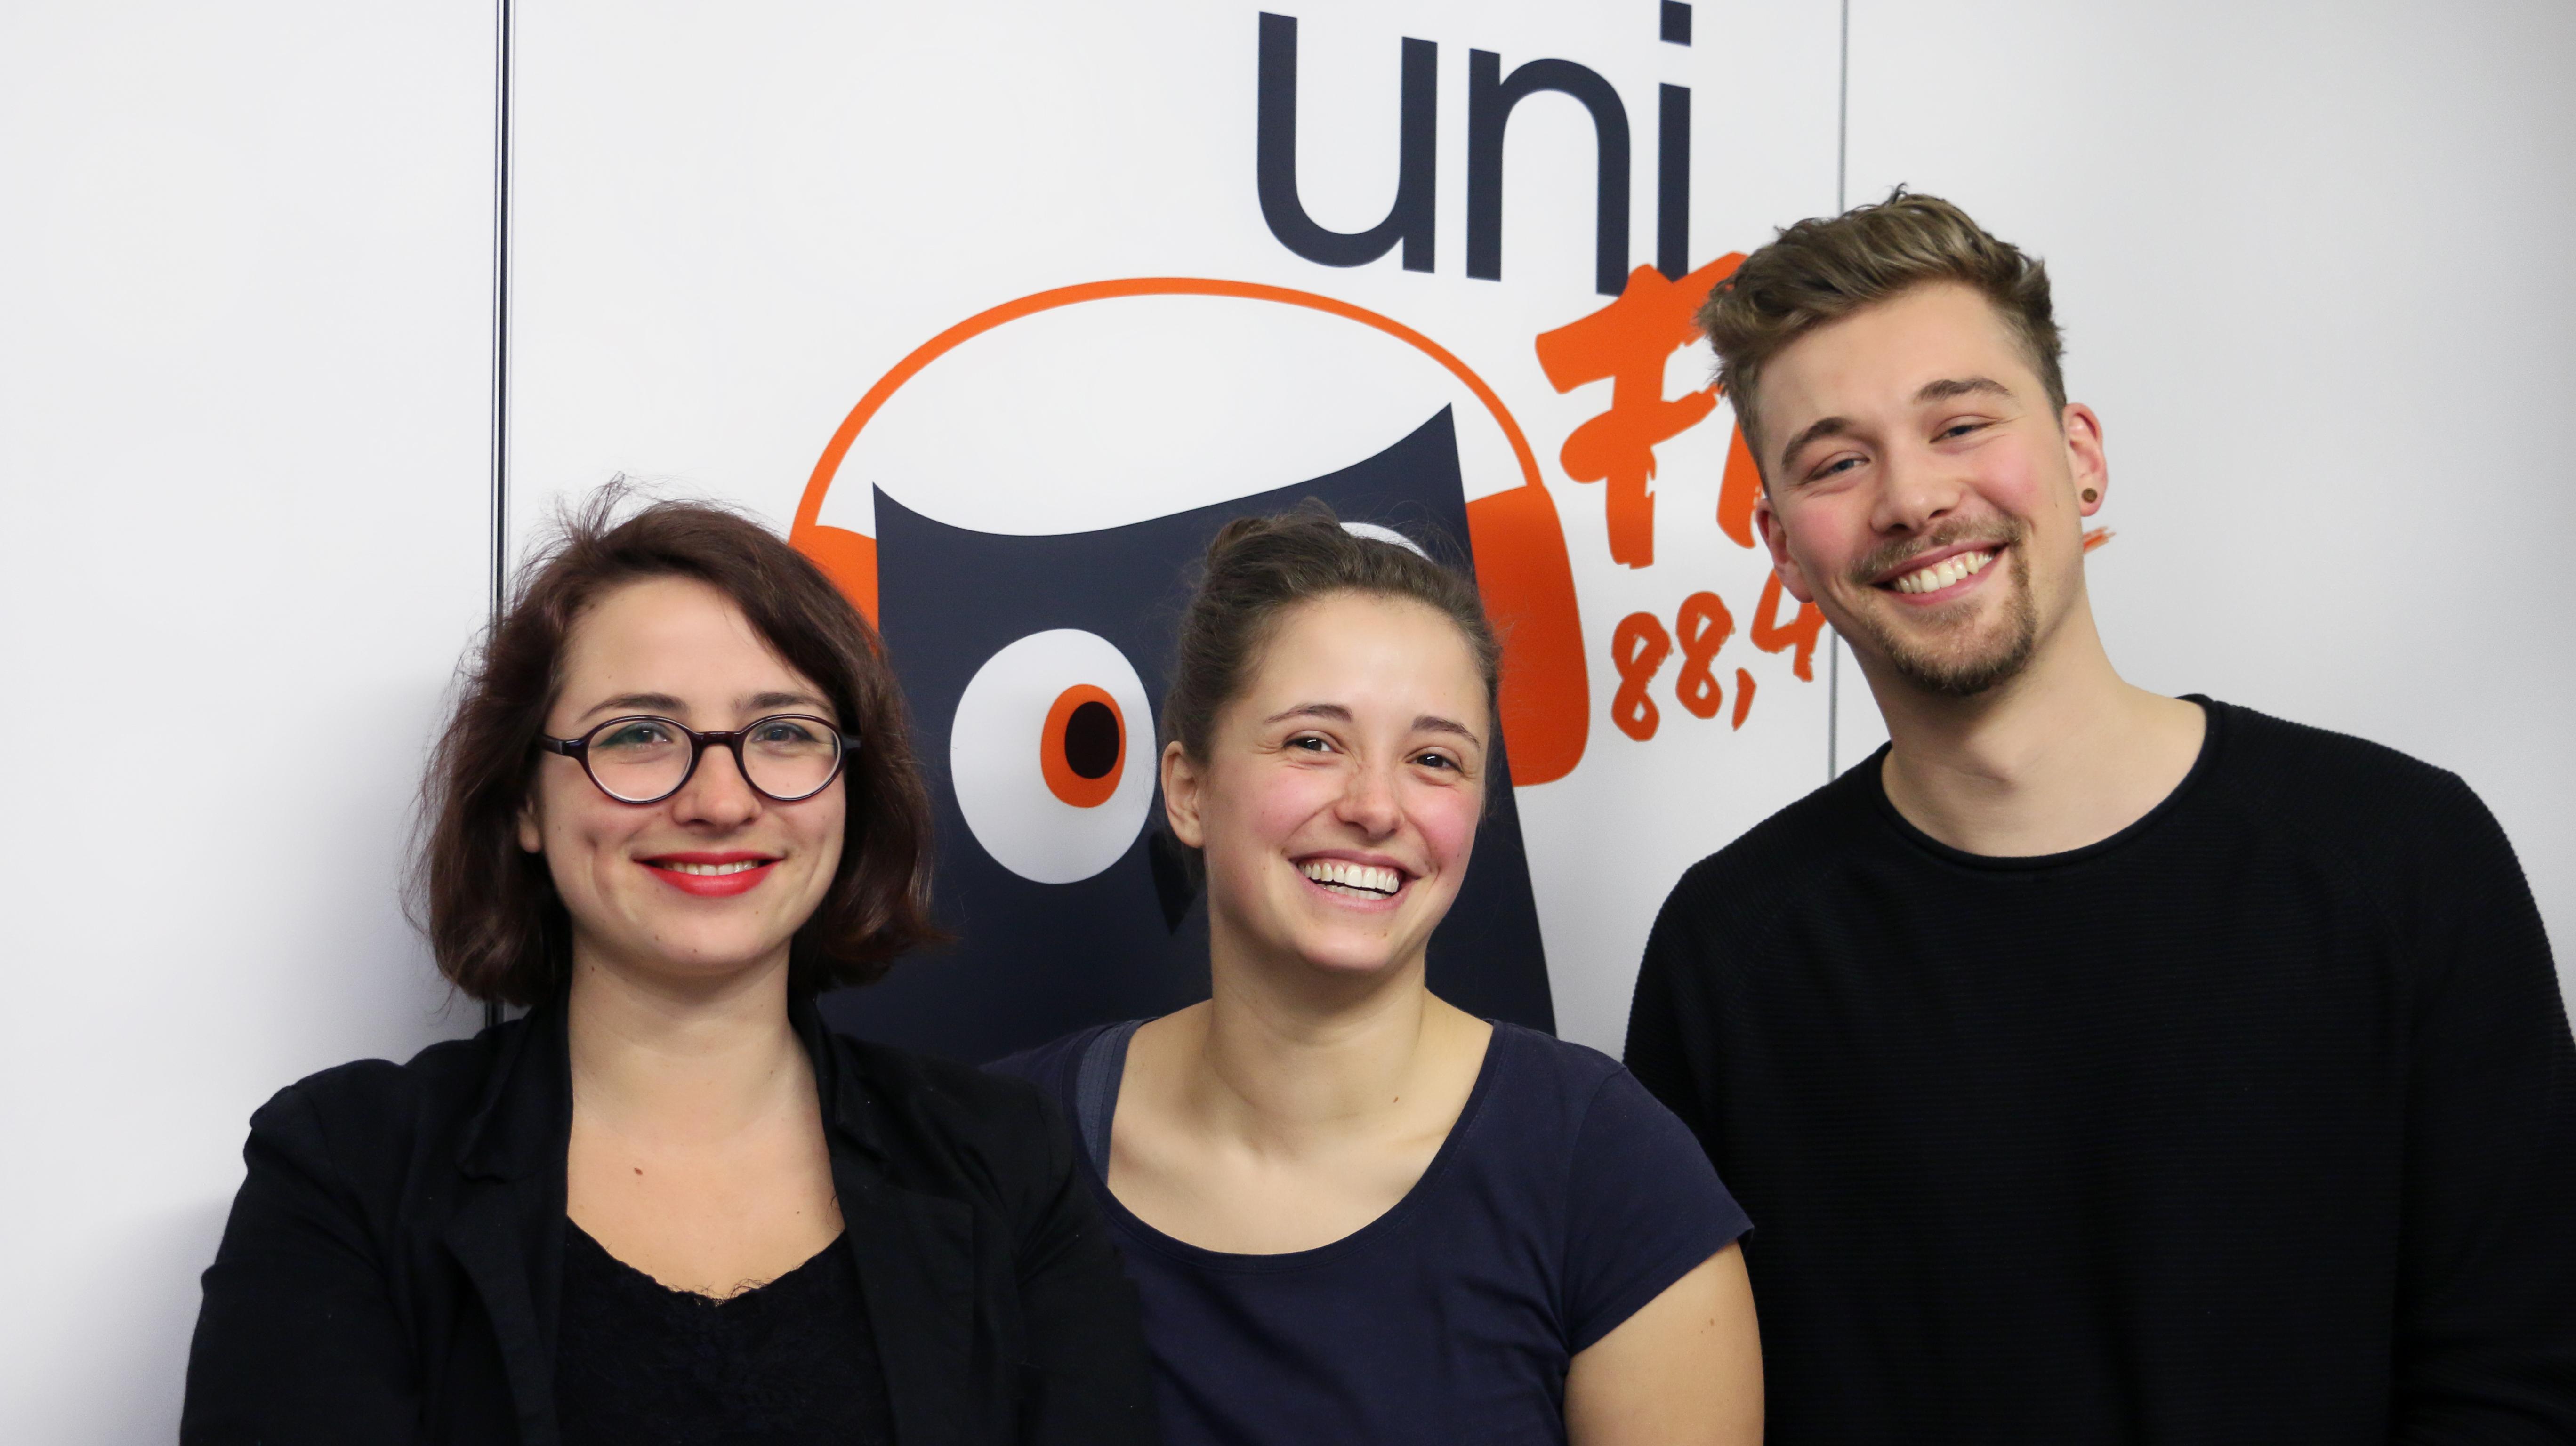 Zusammenleben e.V. bei uniFM